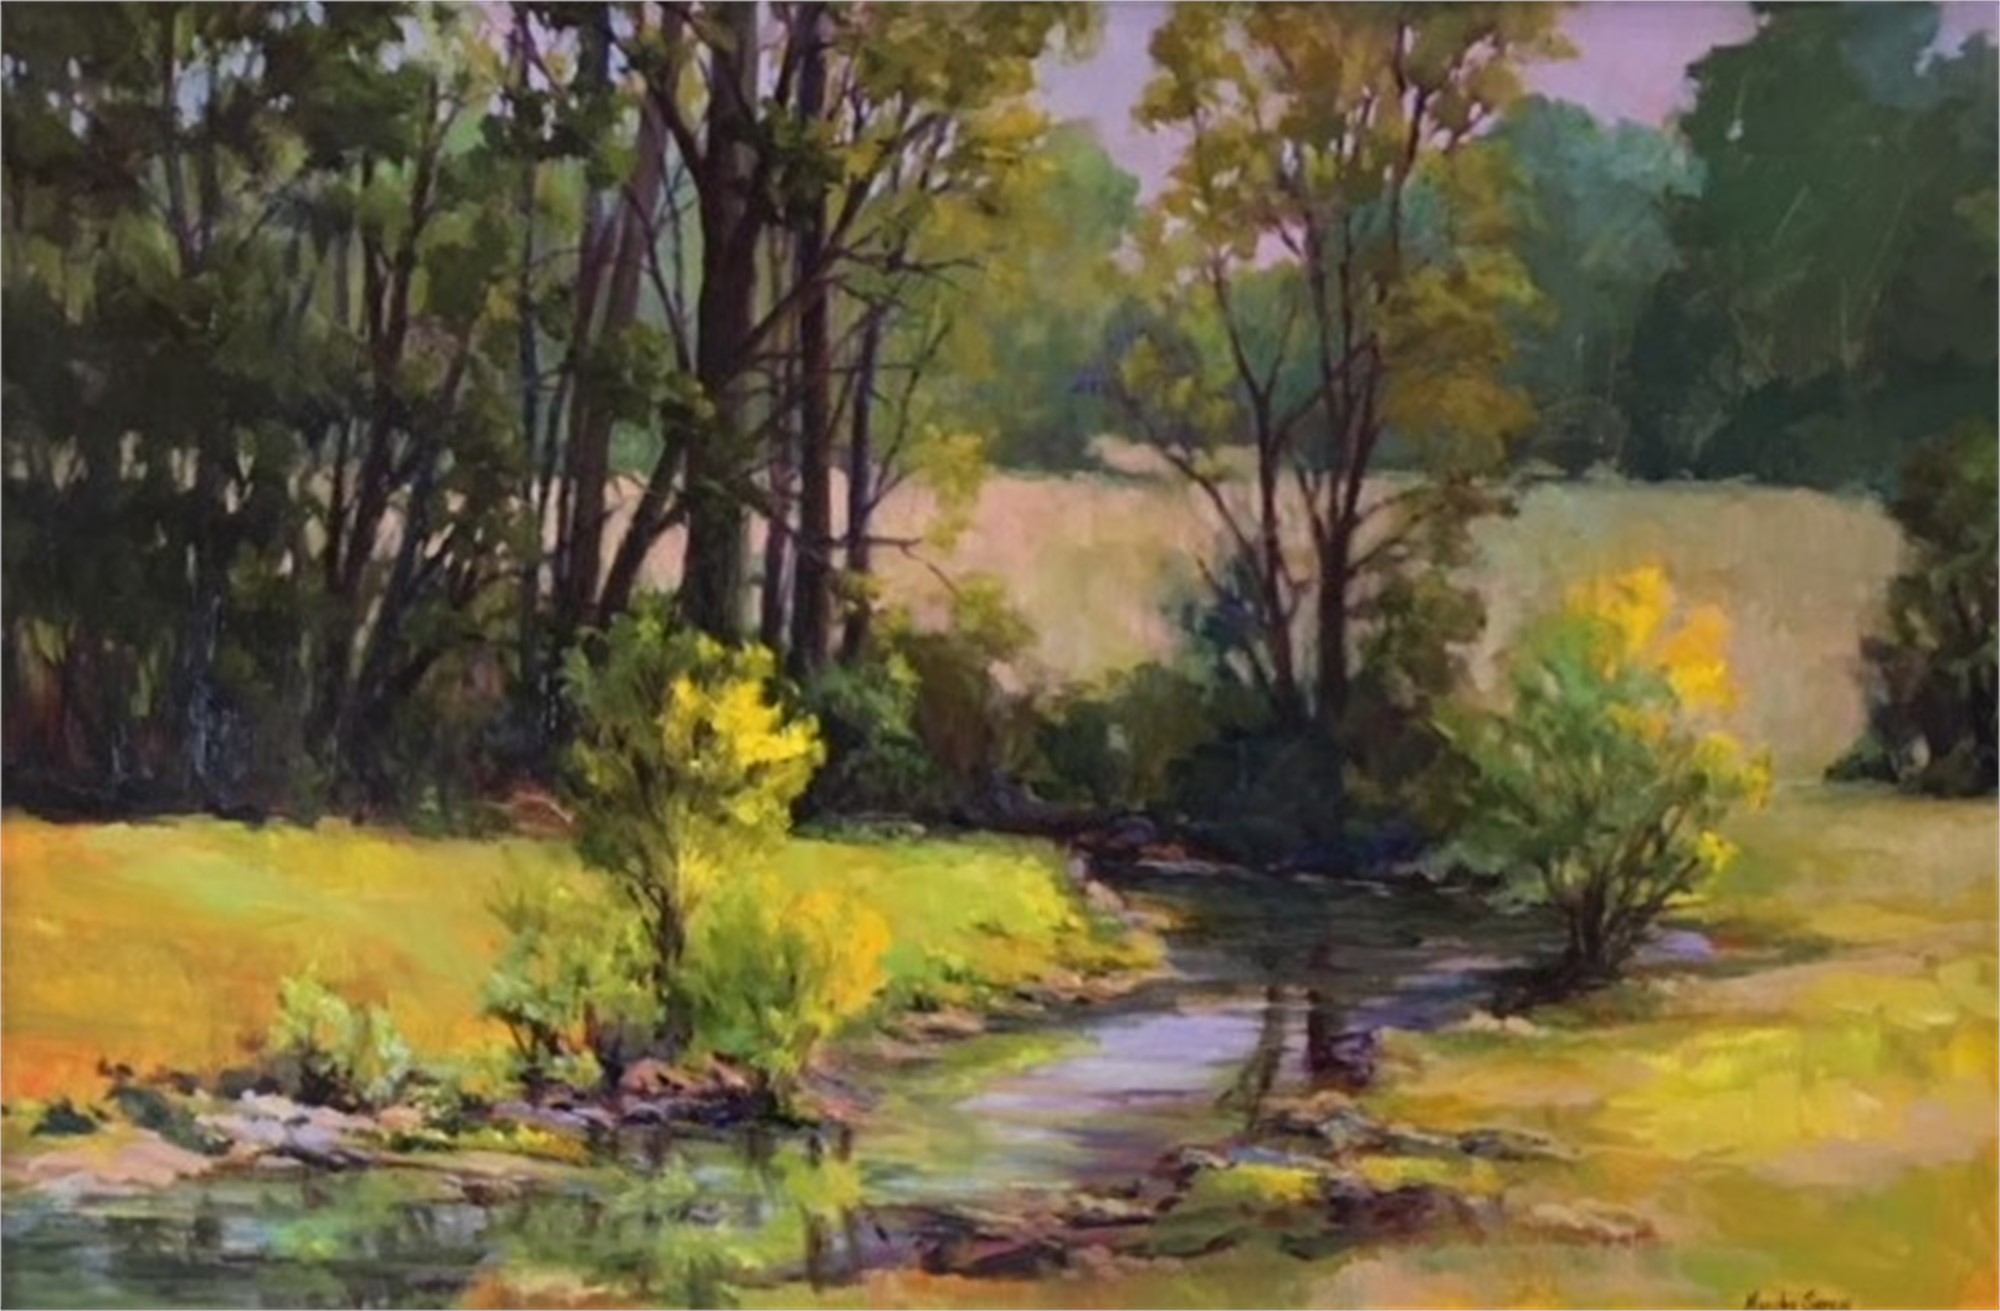 Morning Creek by Marsha Hamby Savage